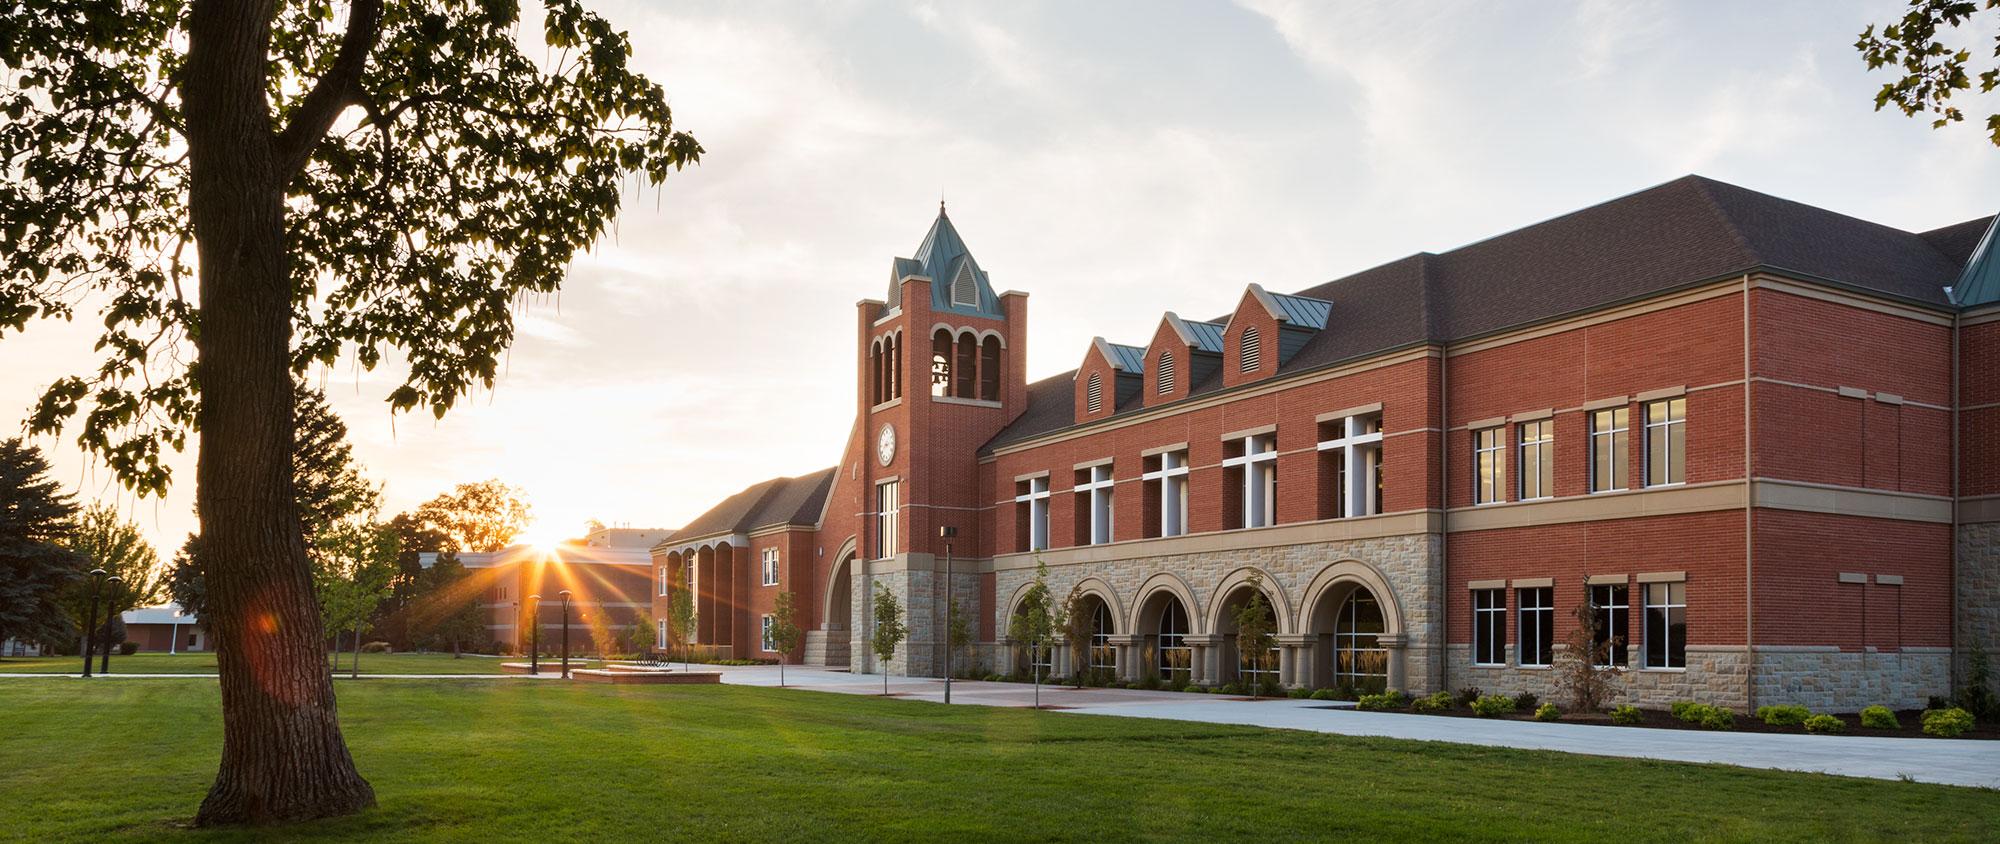 Northwest Nazarene University campus